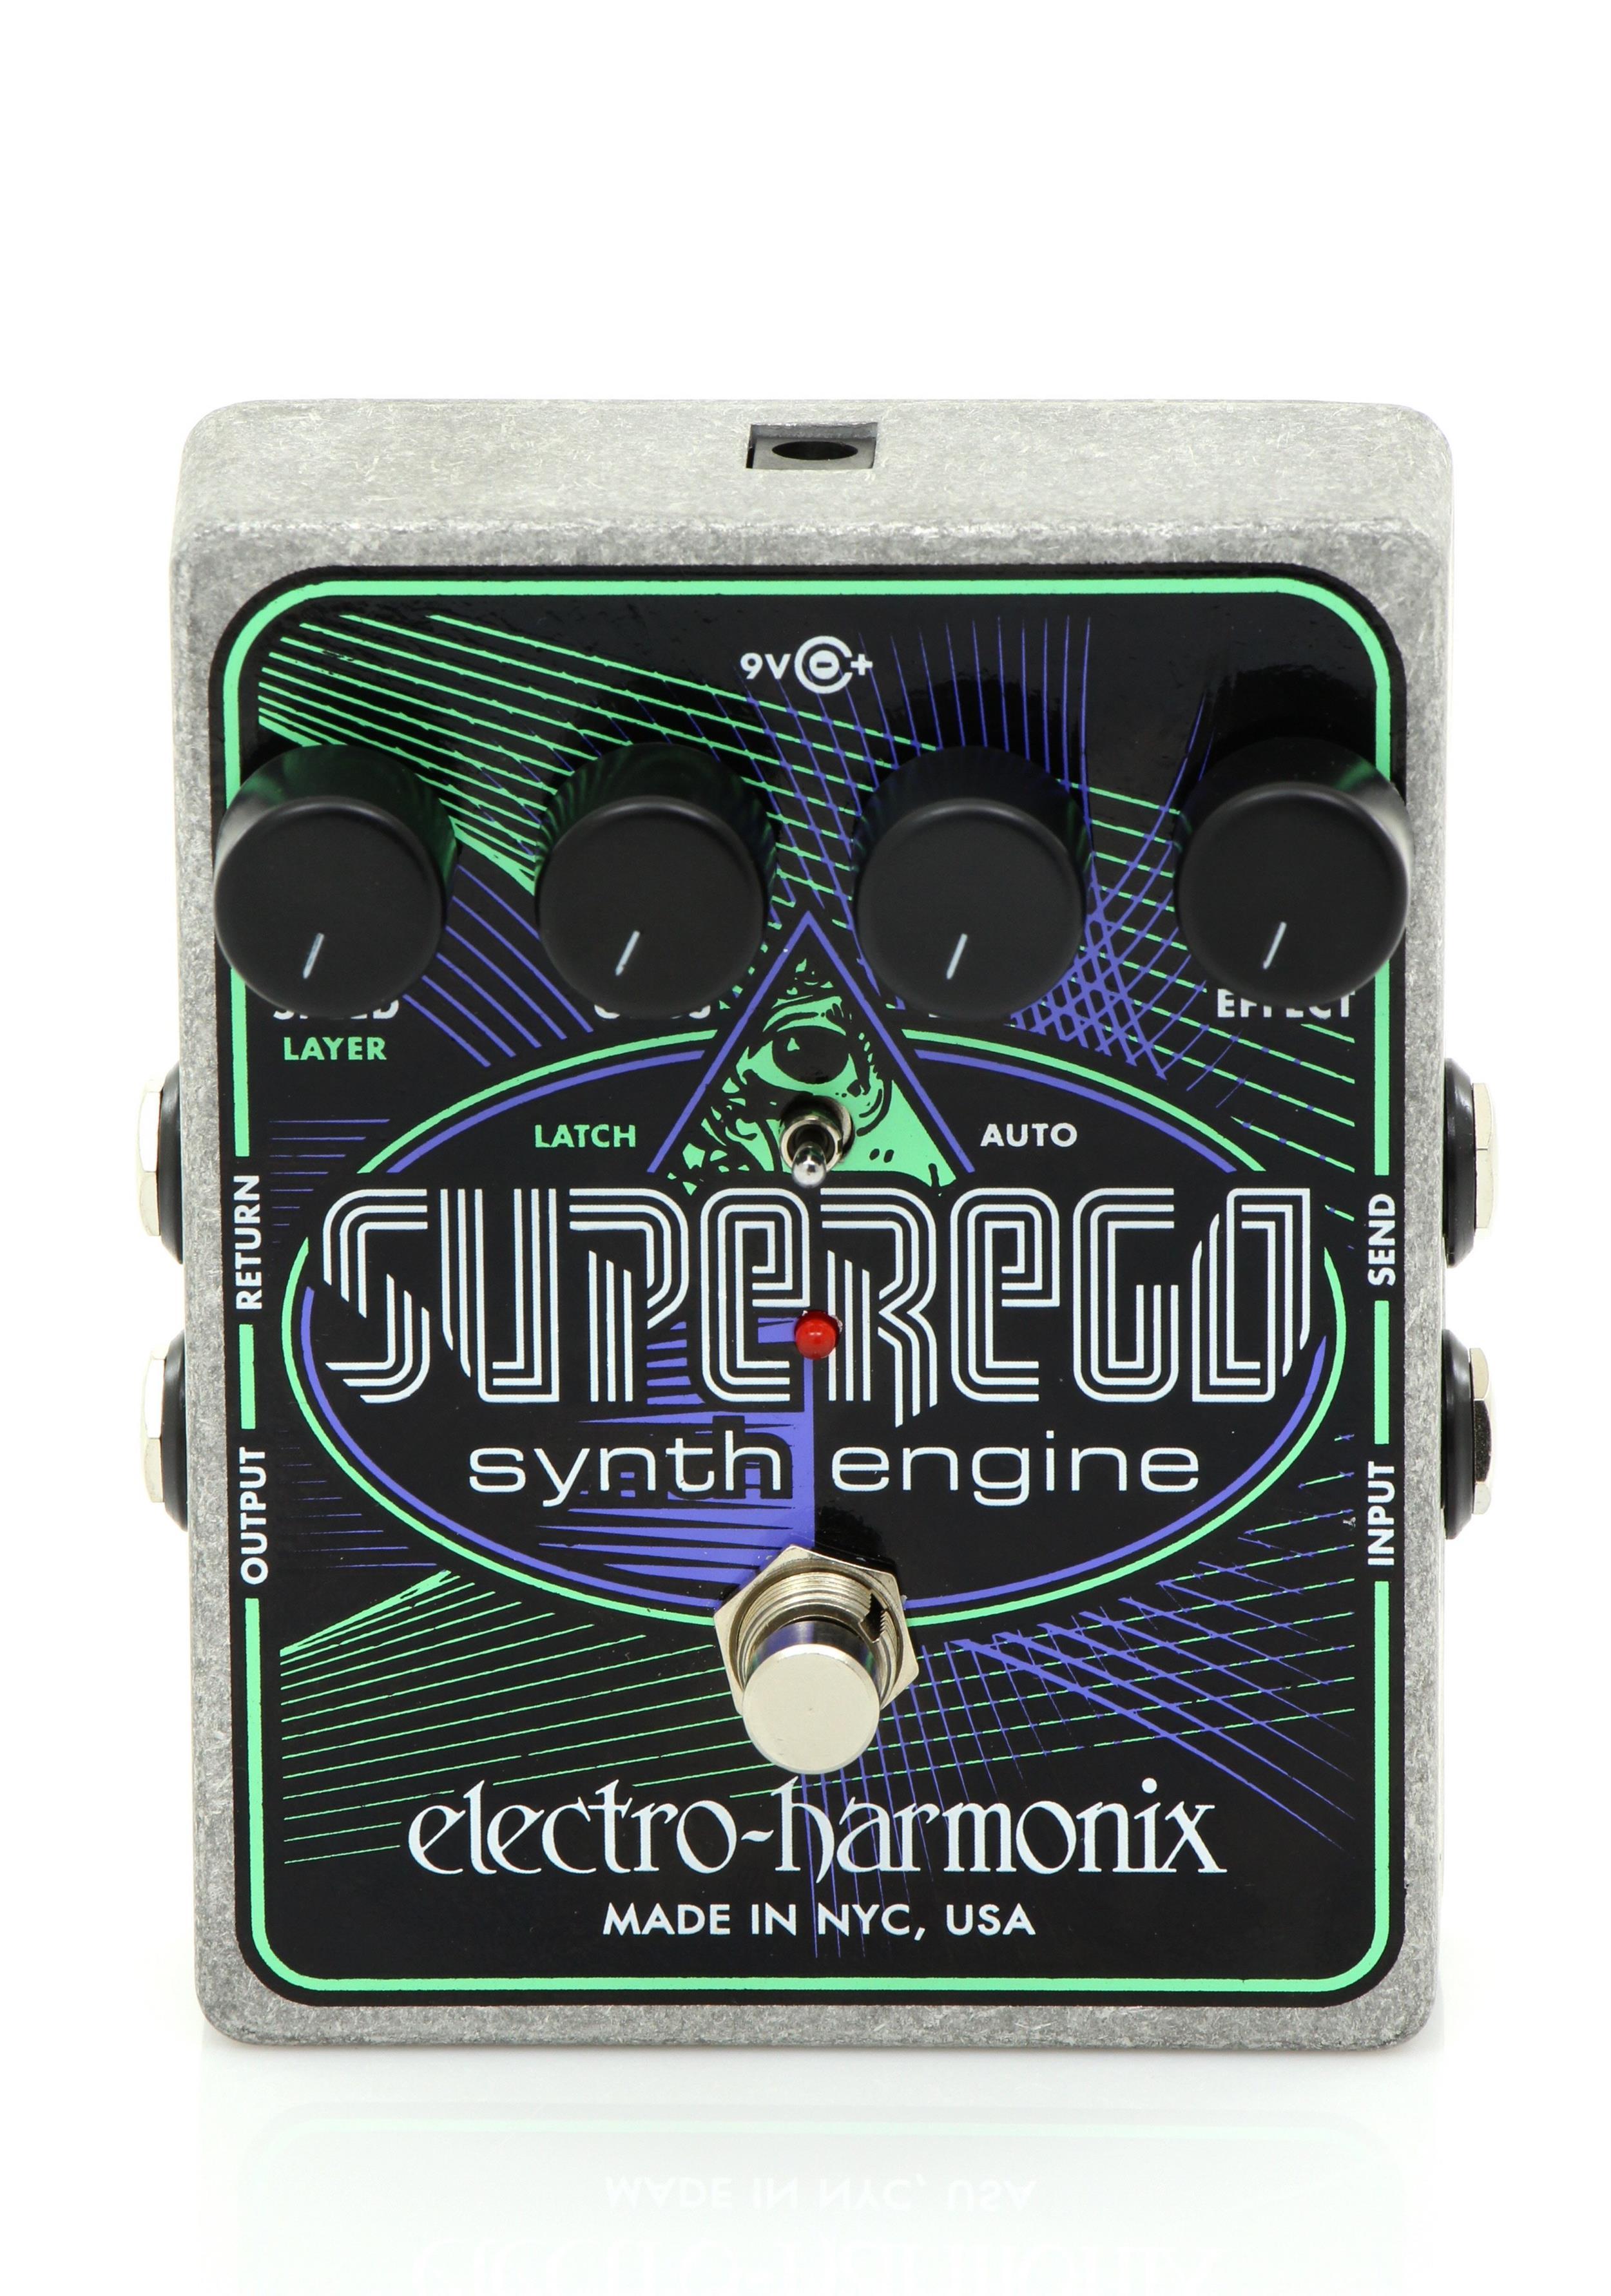 ELECTRO HARMONIX SUPEREGO - Chitarre Effetti - Synth